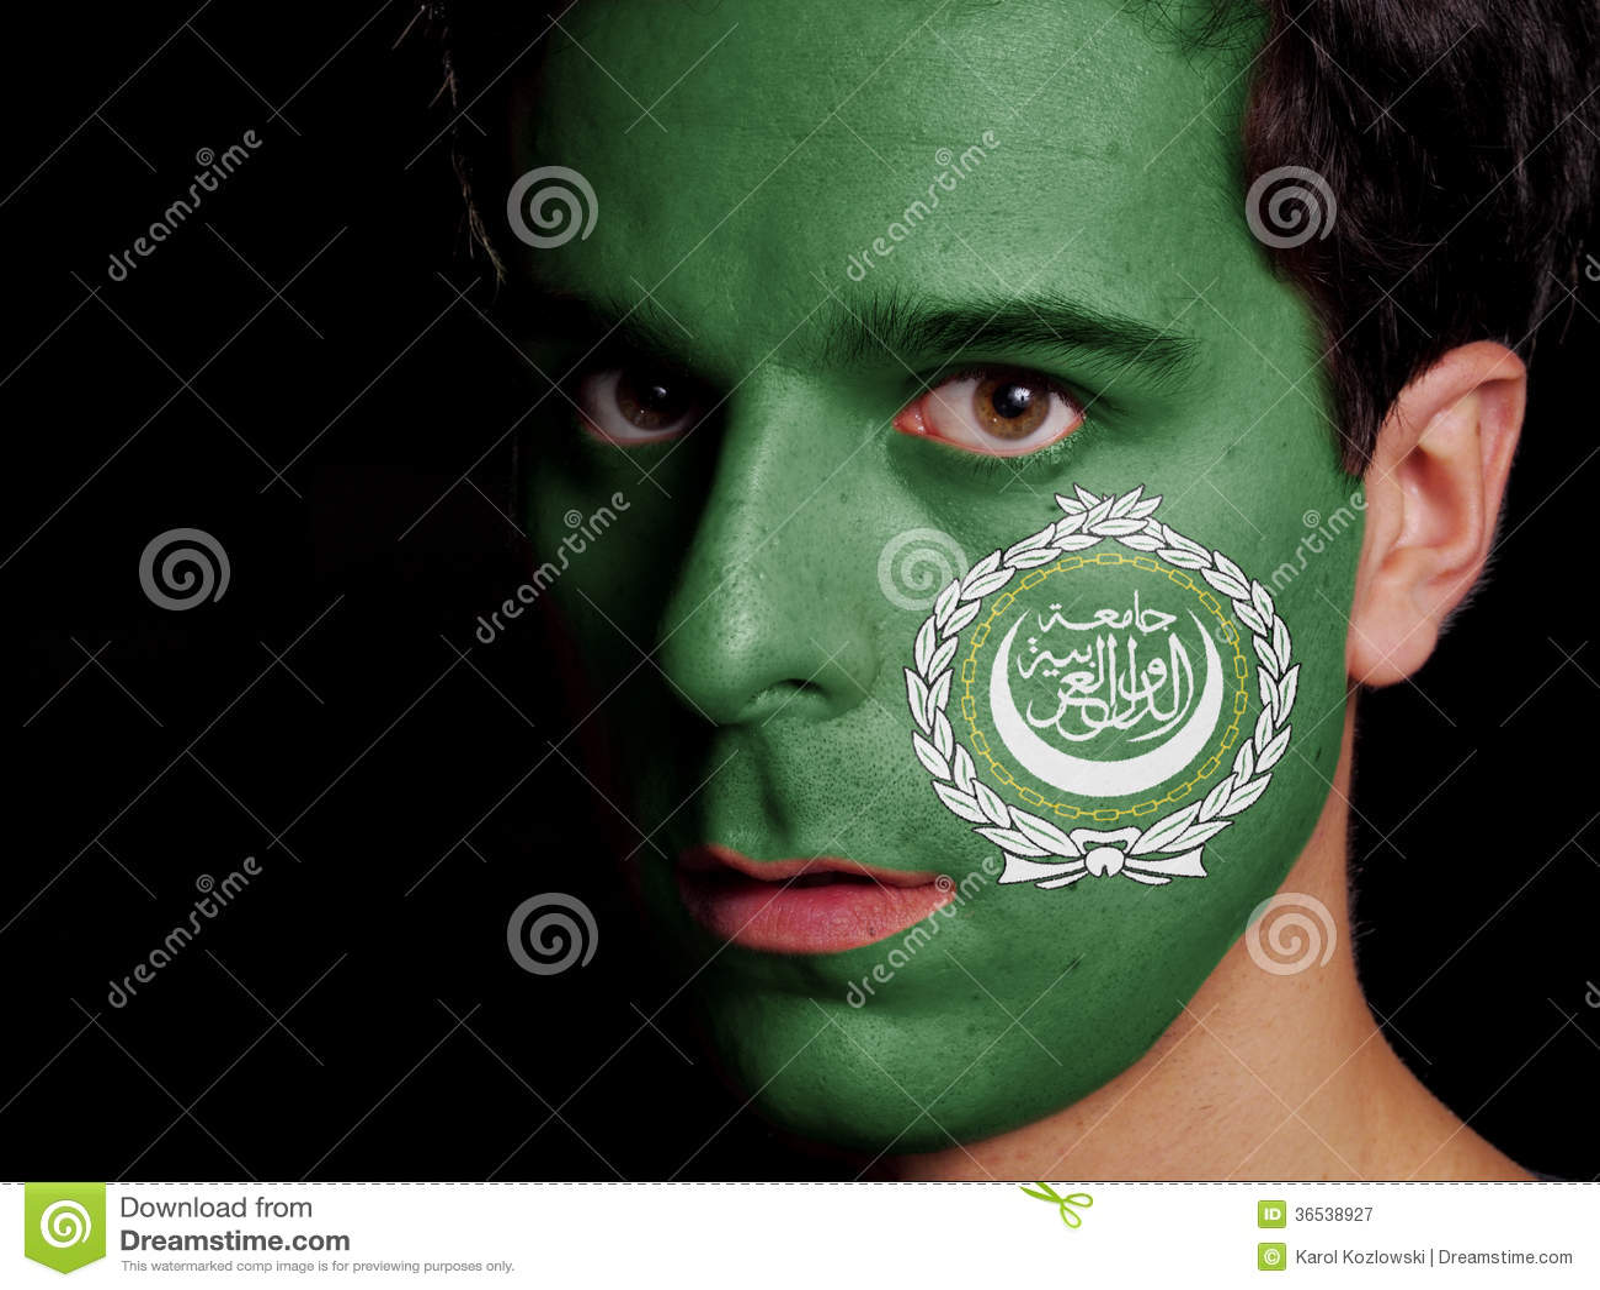 Flag of Arab League